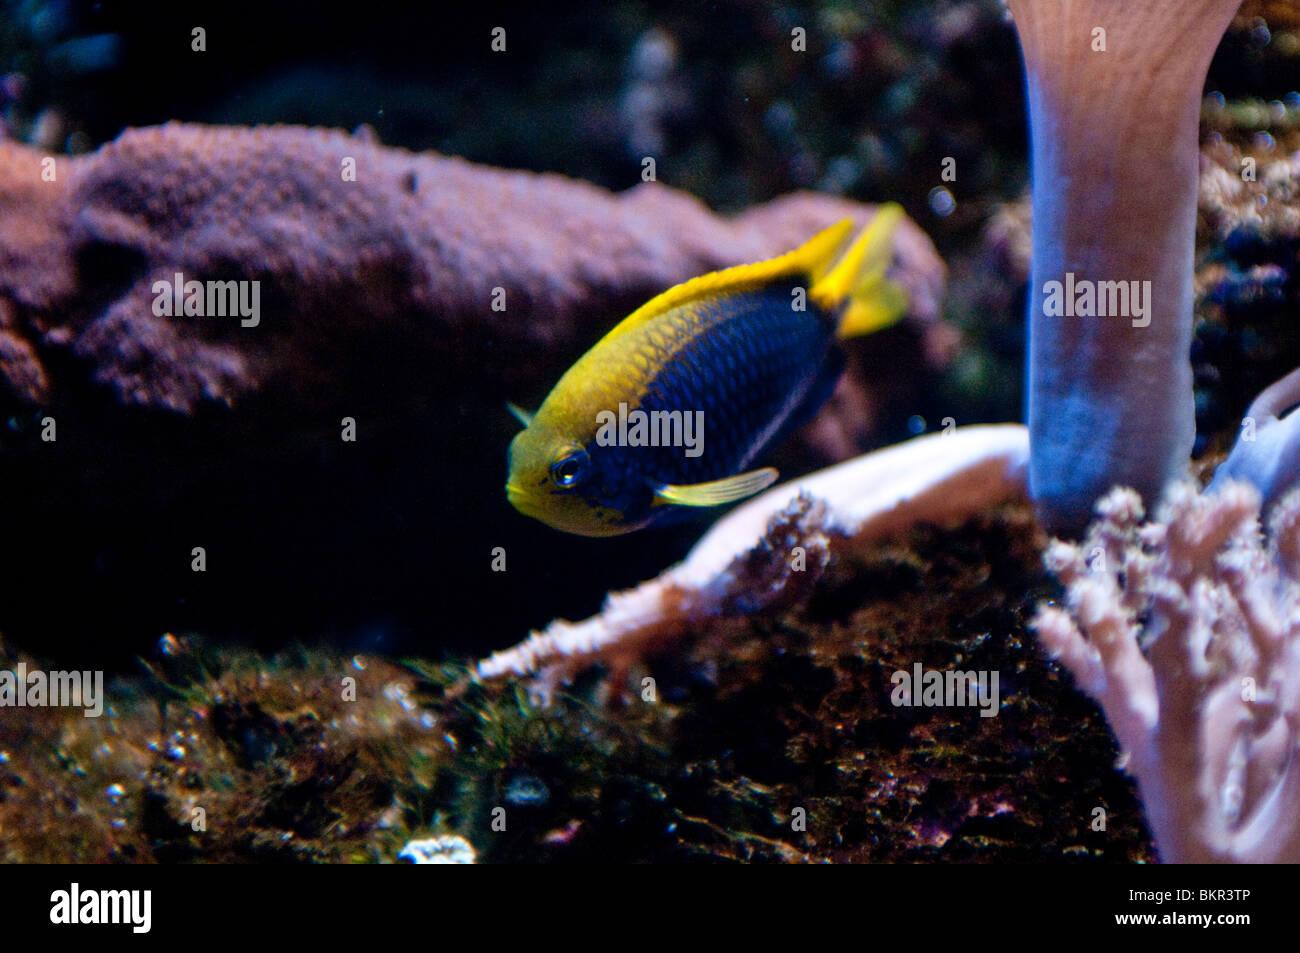 Fish, Great Barrier Reef, Sydney Aquarium, Sydney, Australia - Stock Image